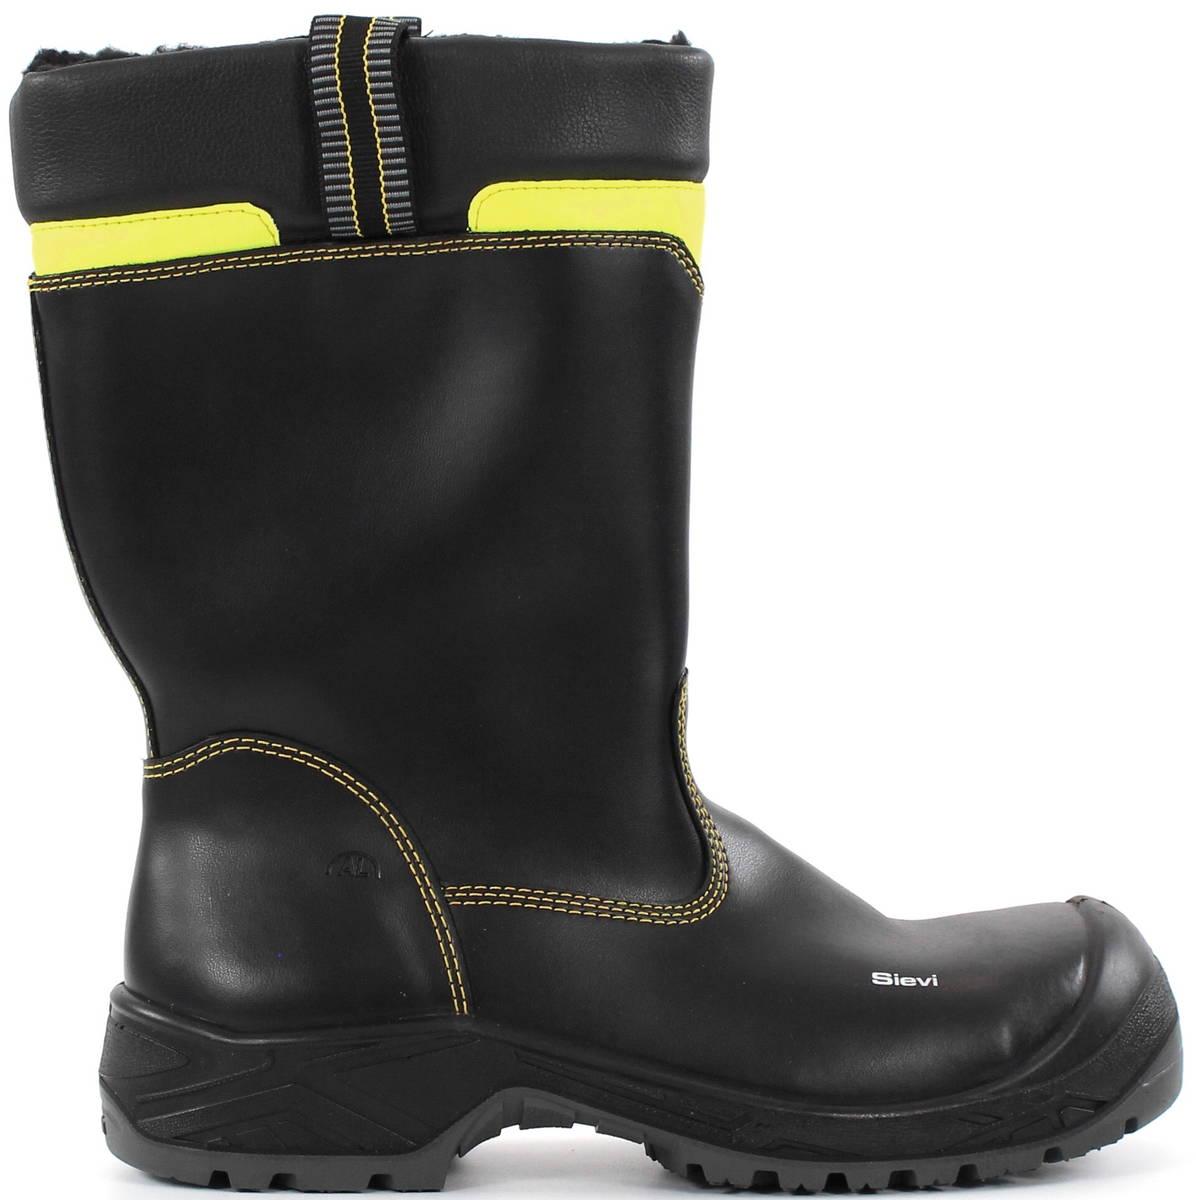 7b6d10bf Sievi Safety shoes A1 hit 9 XL+ S3 HRO - Stilettoshop.eu webstore